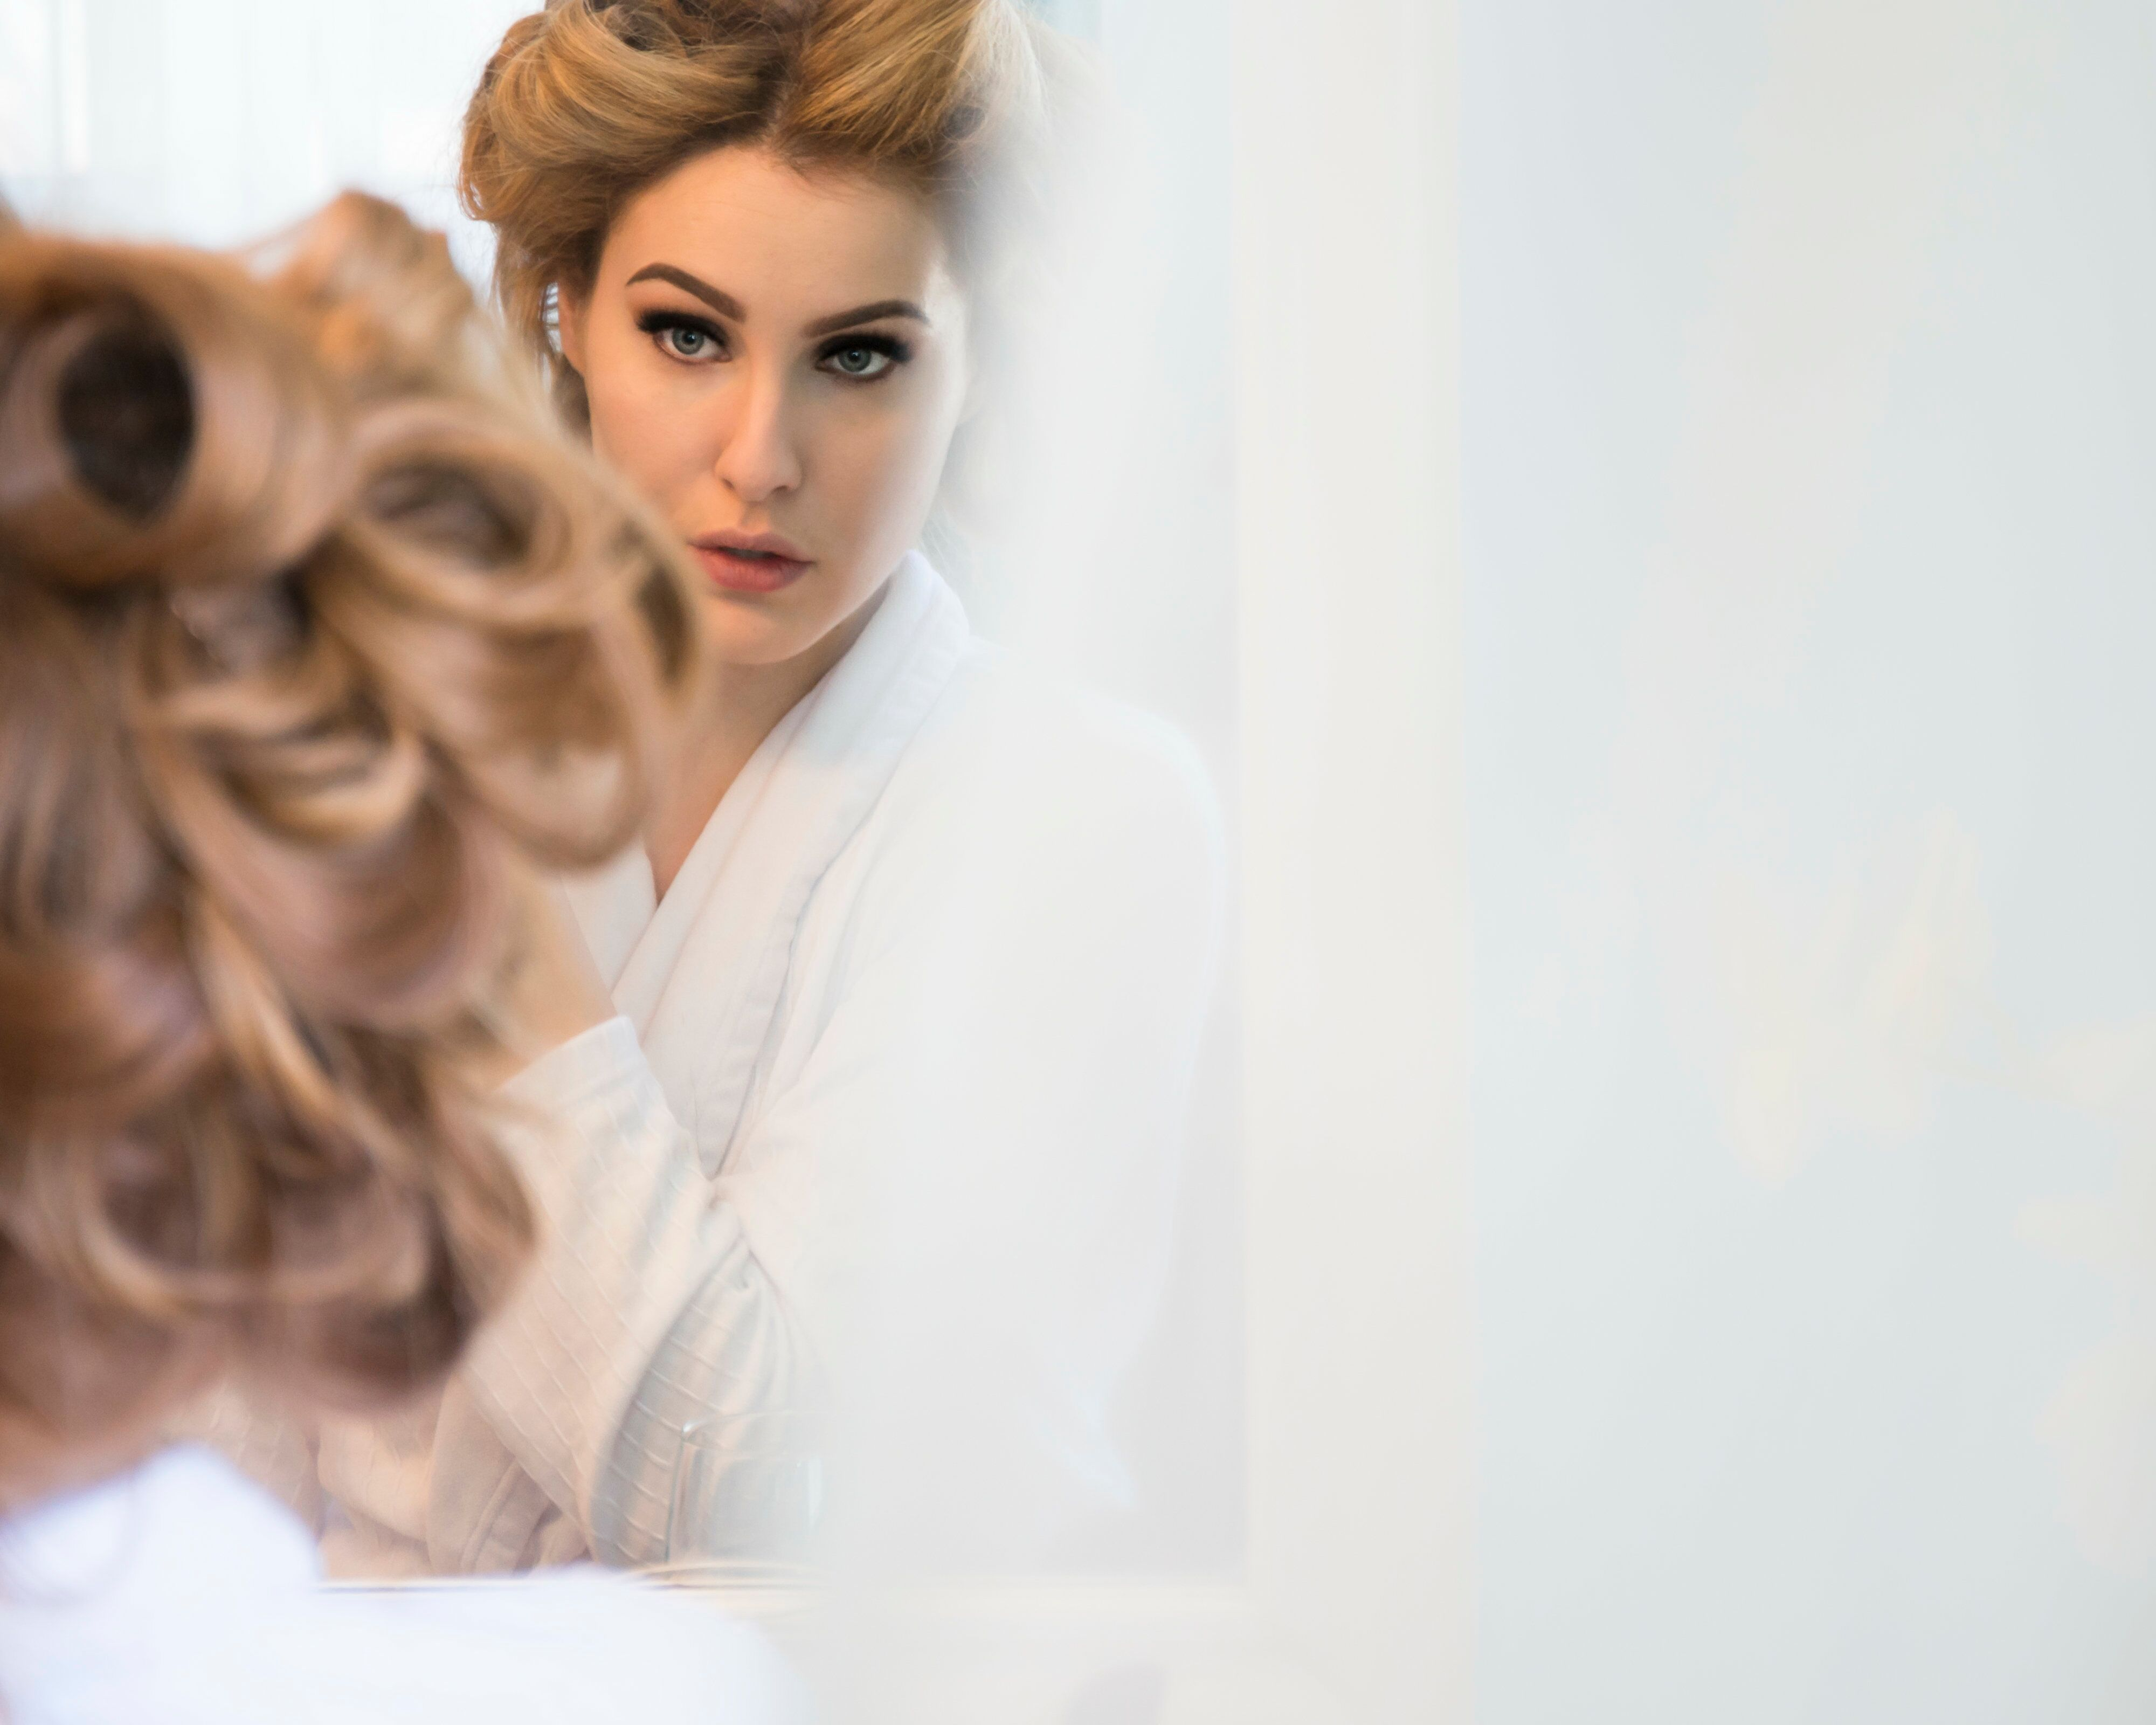 rachel toussaint makeup artistry | beauty - danbury, ct